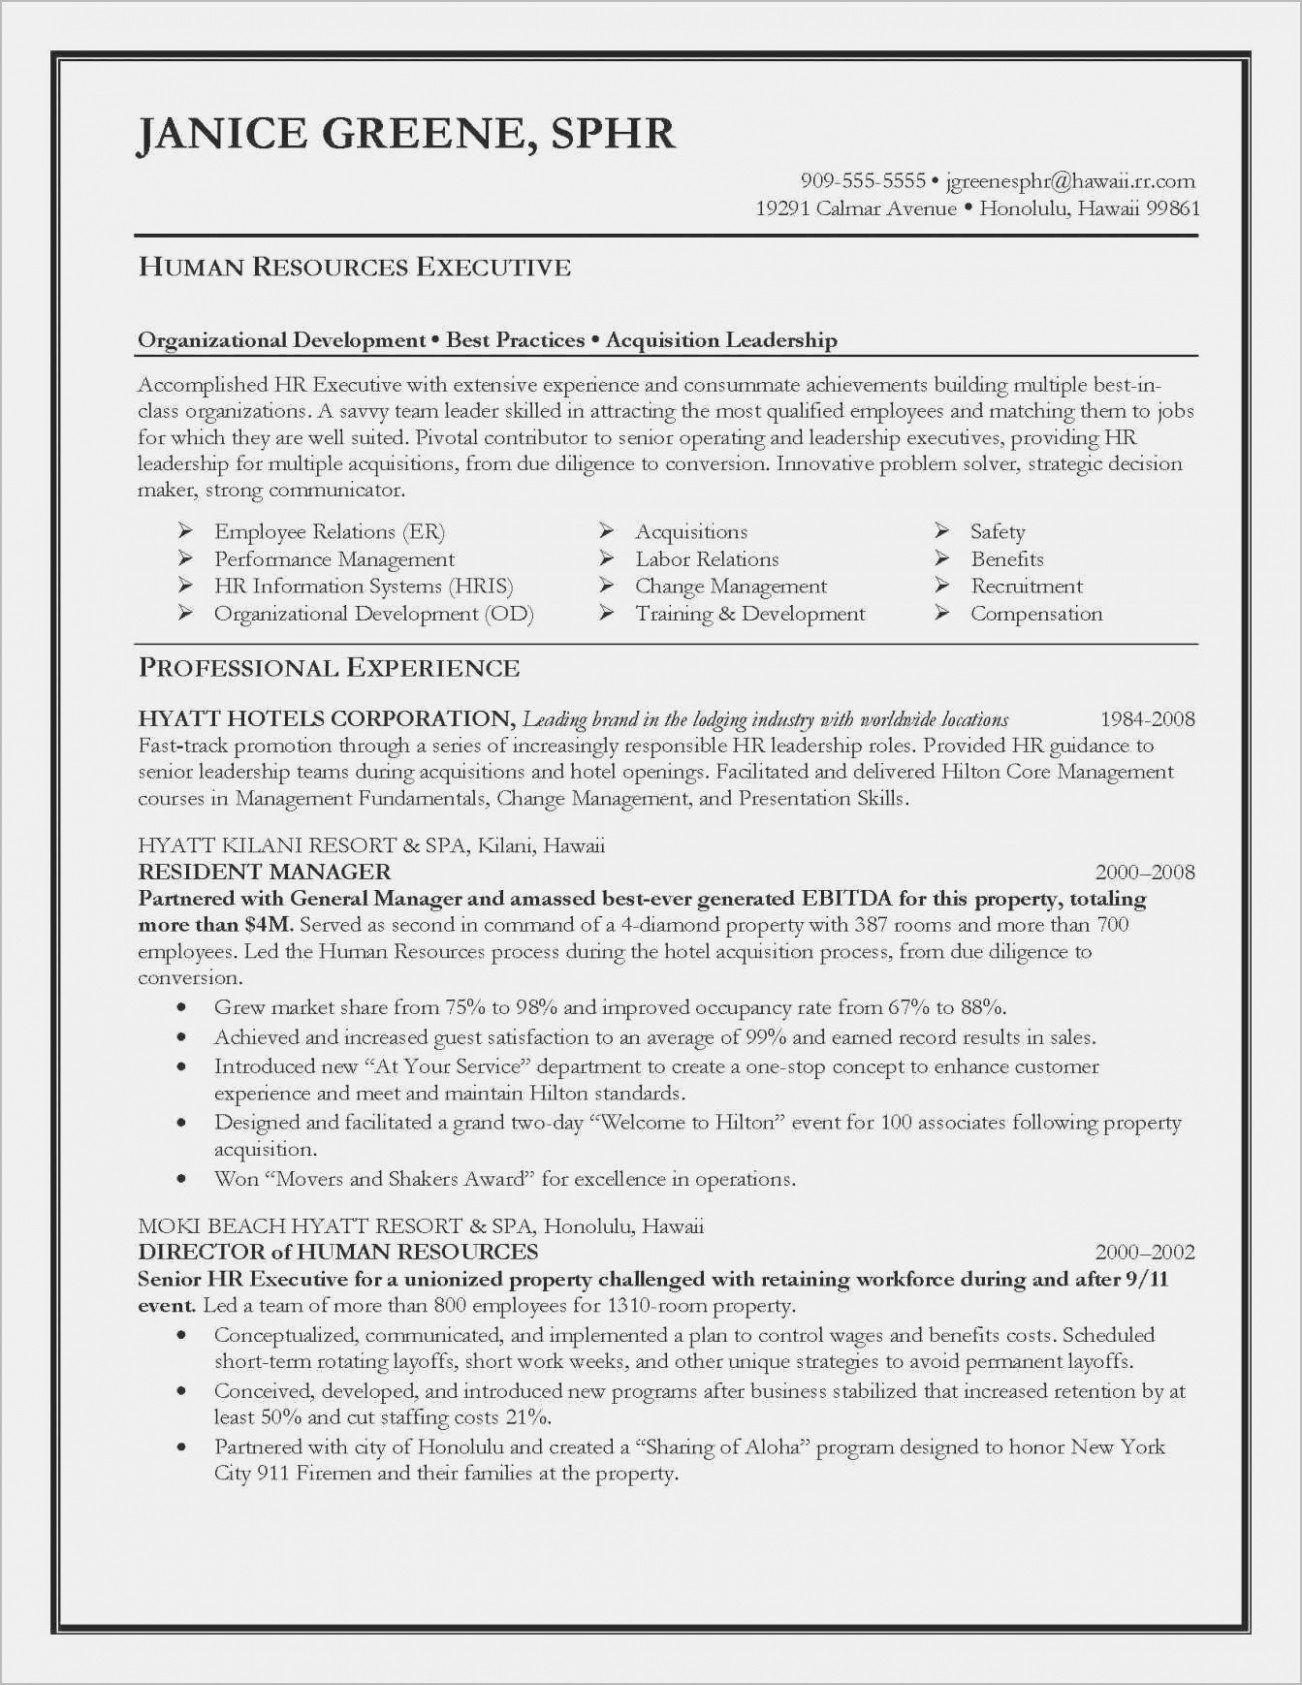 Cdl Truck Driver Job Description For Resume Awesome Uber Driver Resume Nifberpentersdaughter